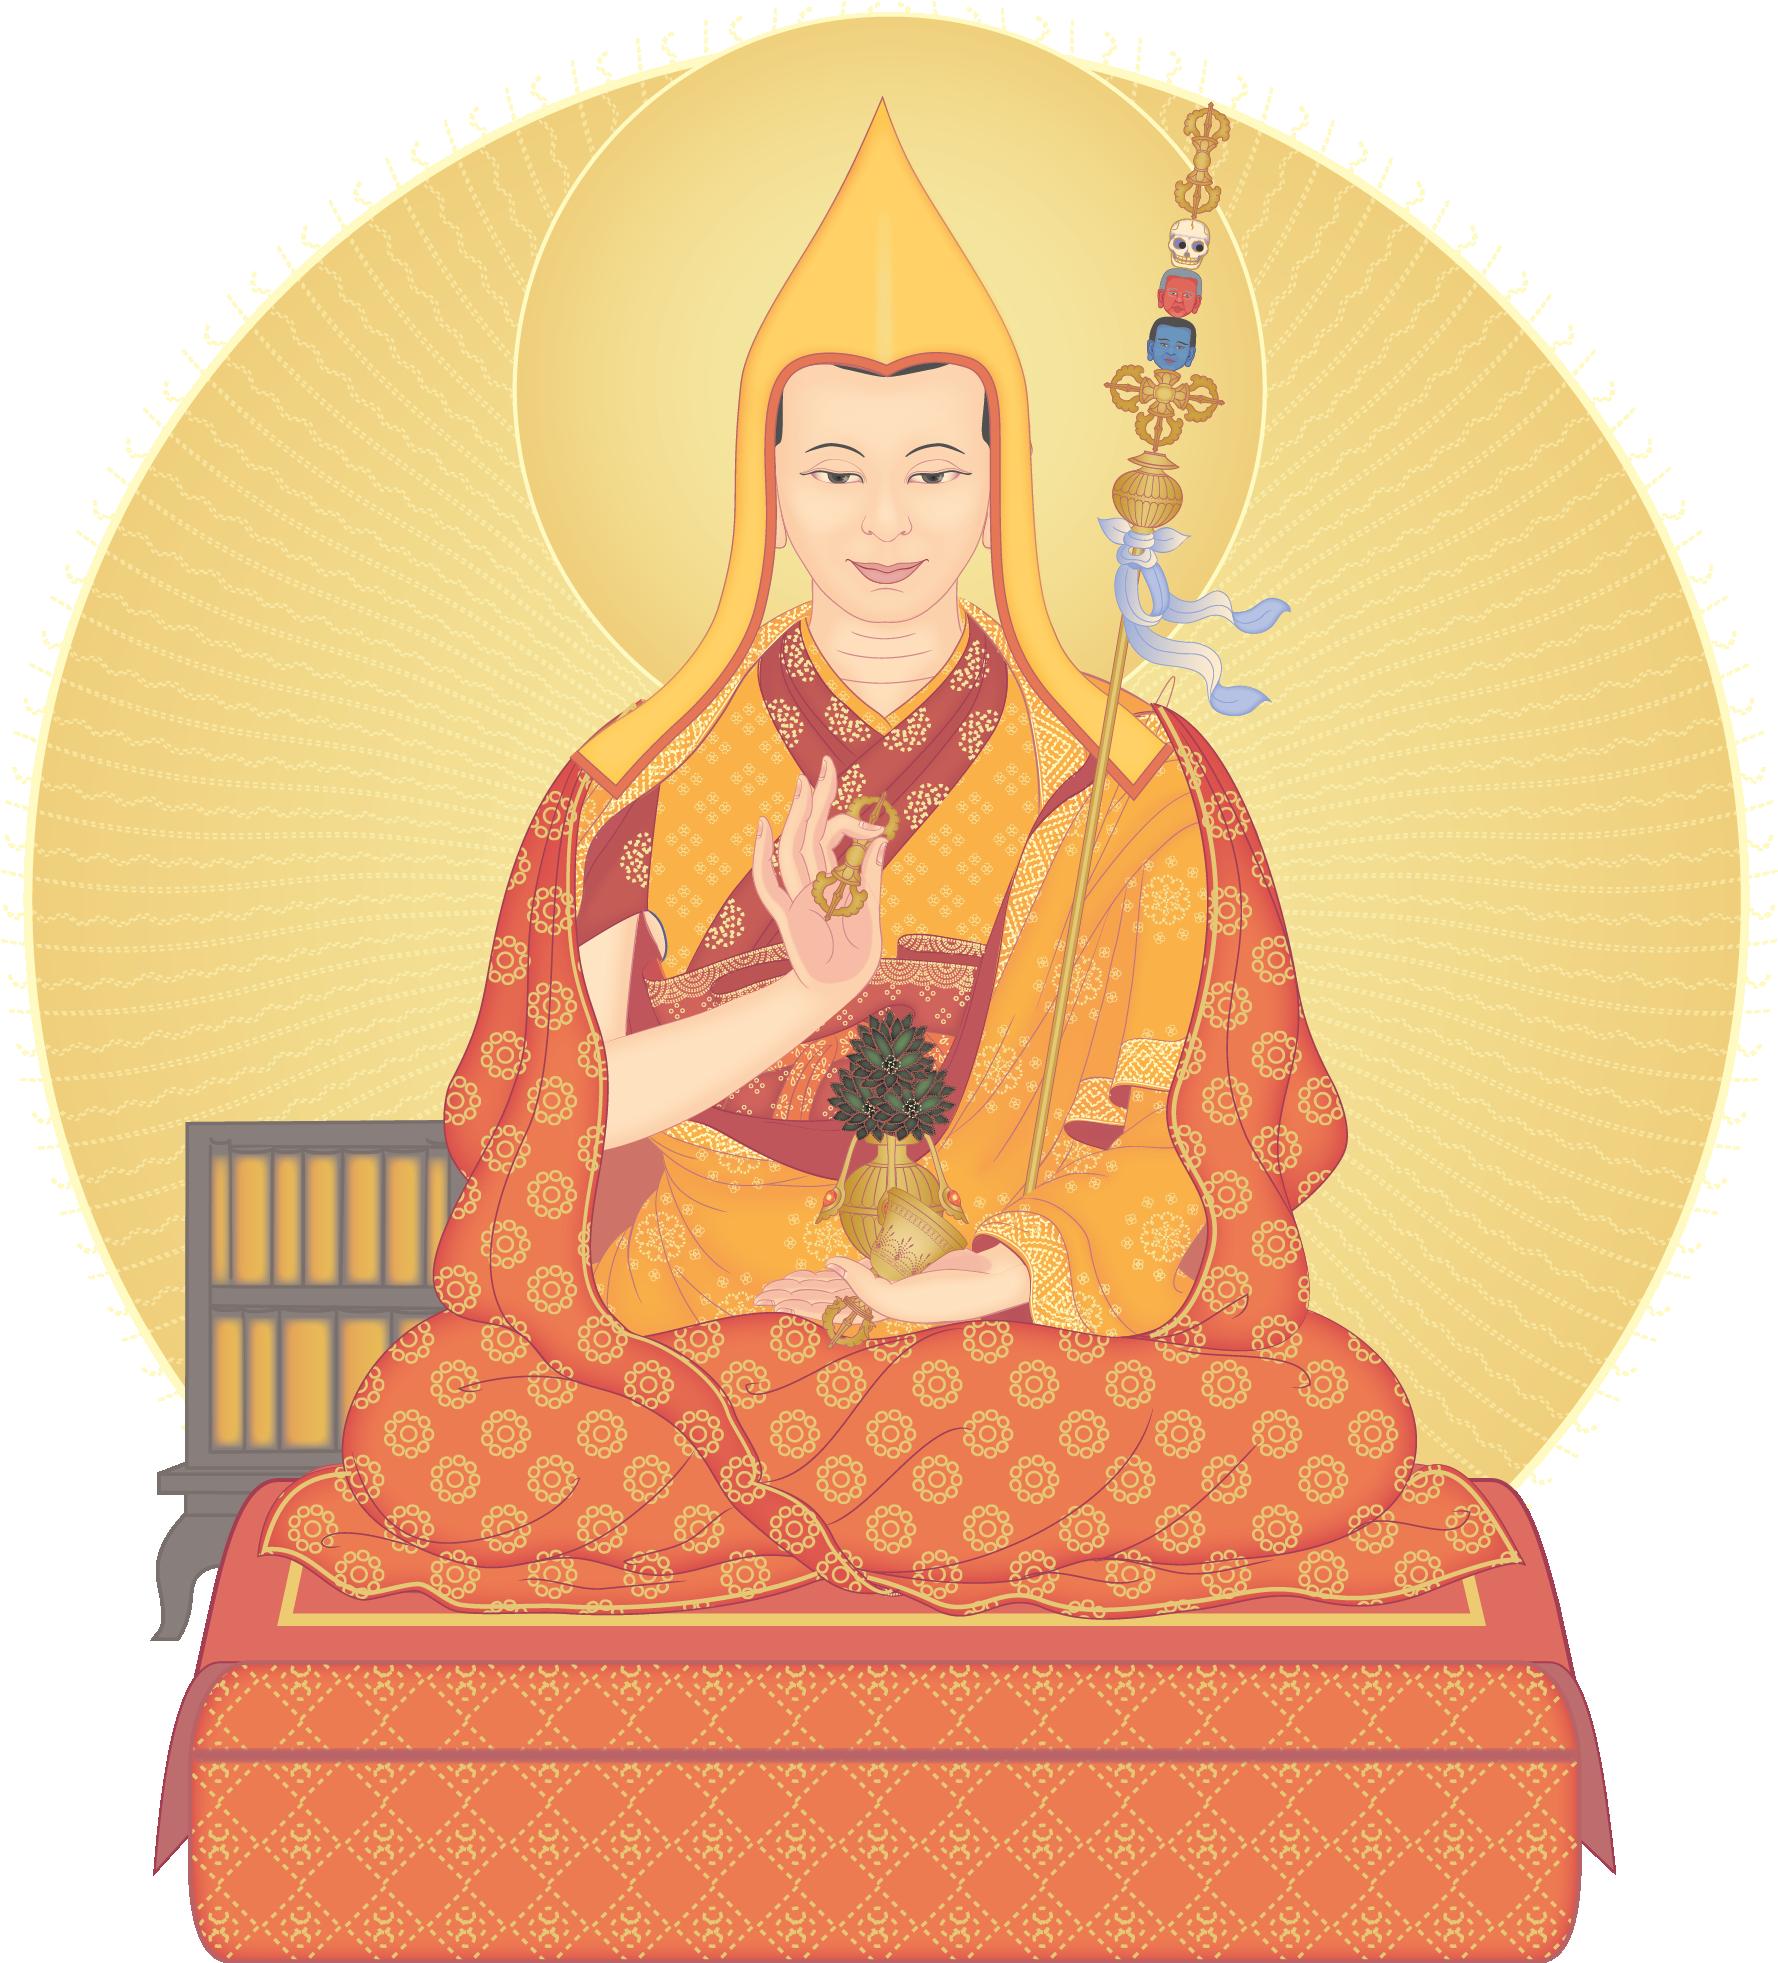 Venerable-Geshe-Kelsang-Gyatso-Rinpoche